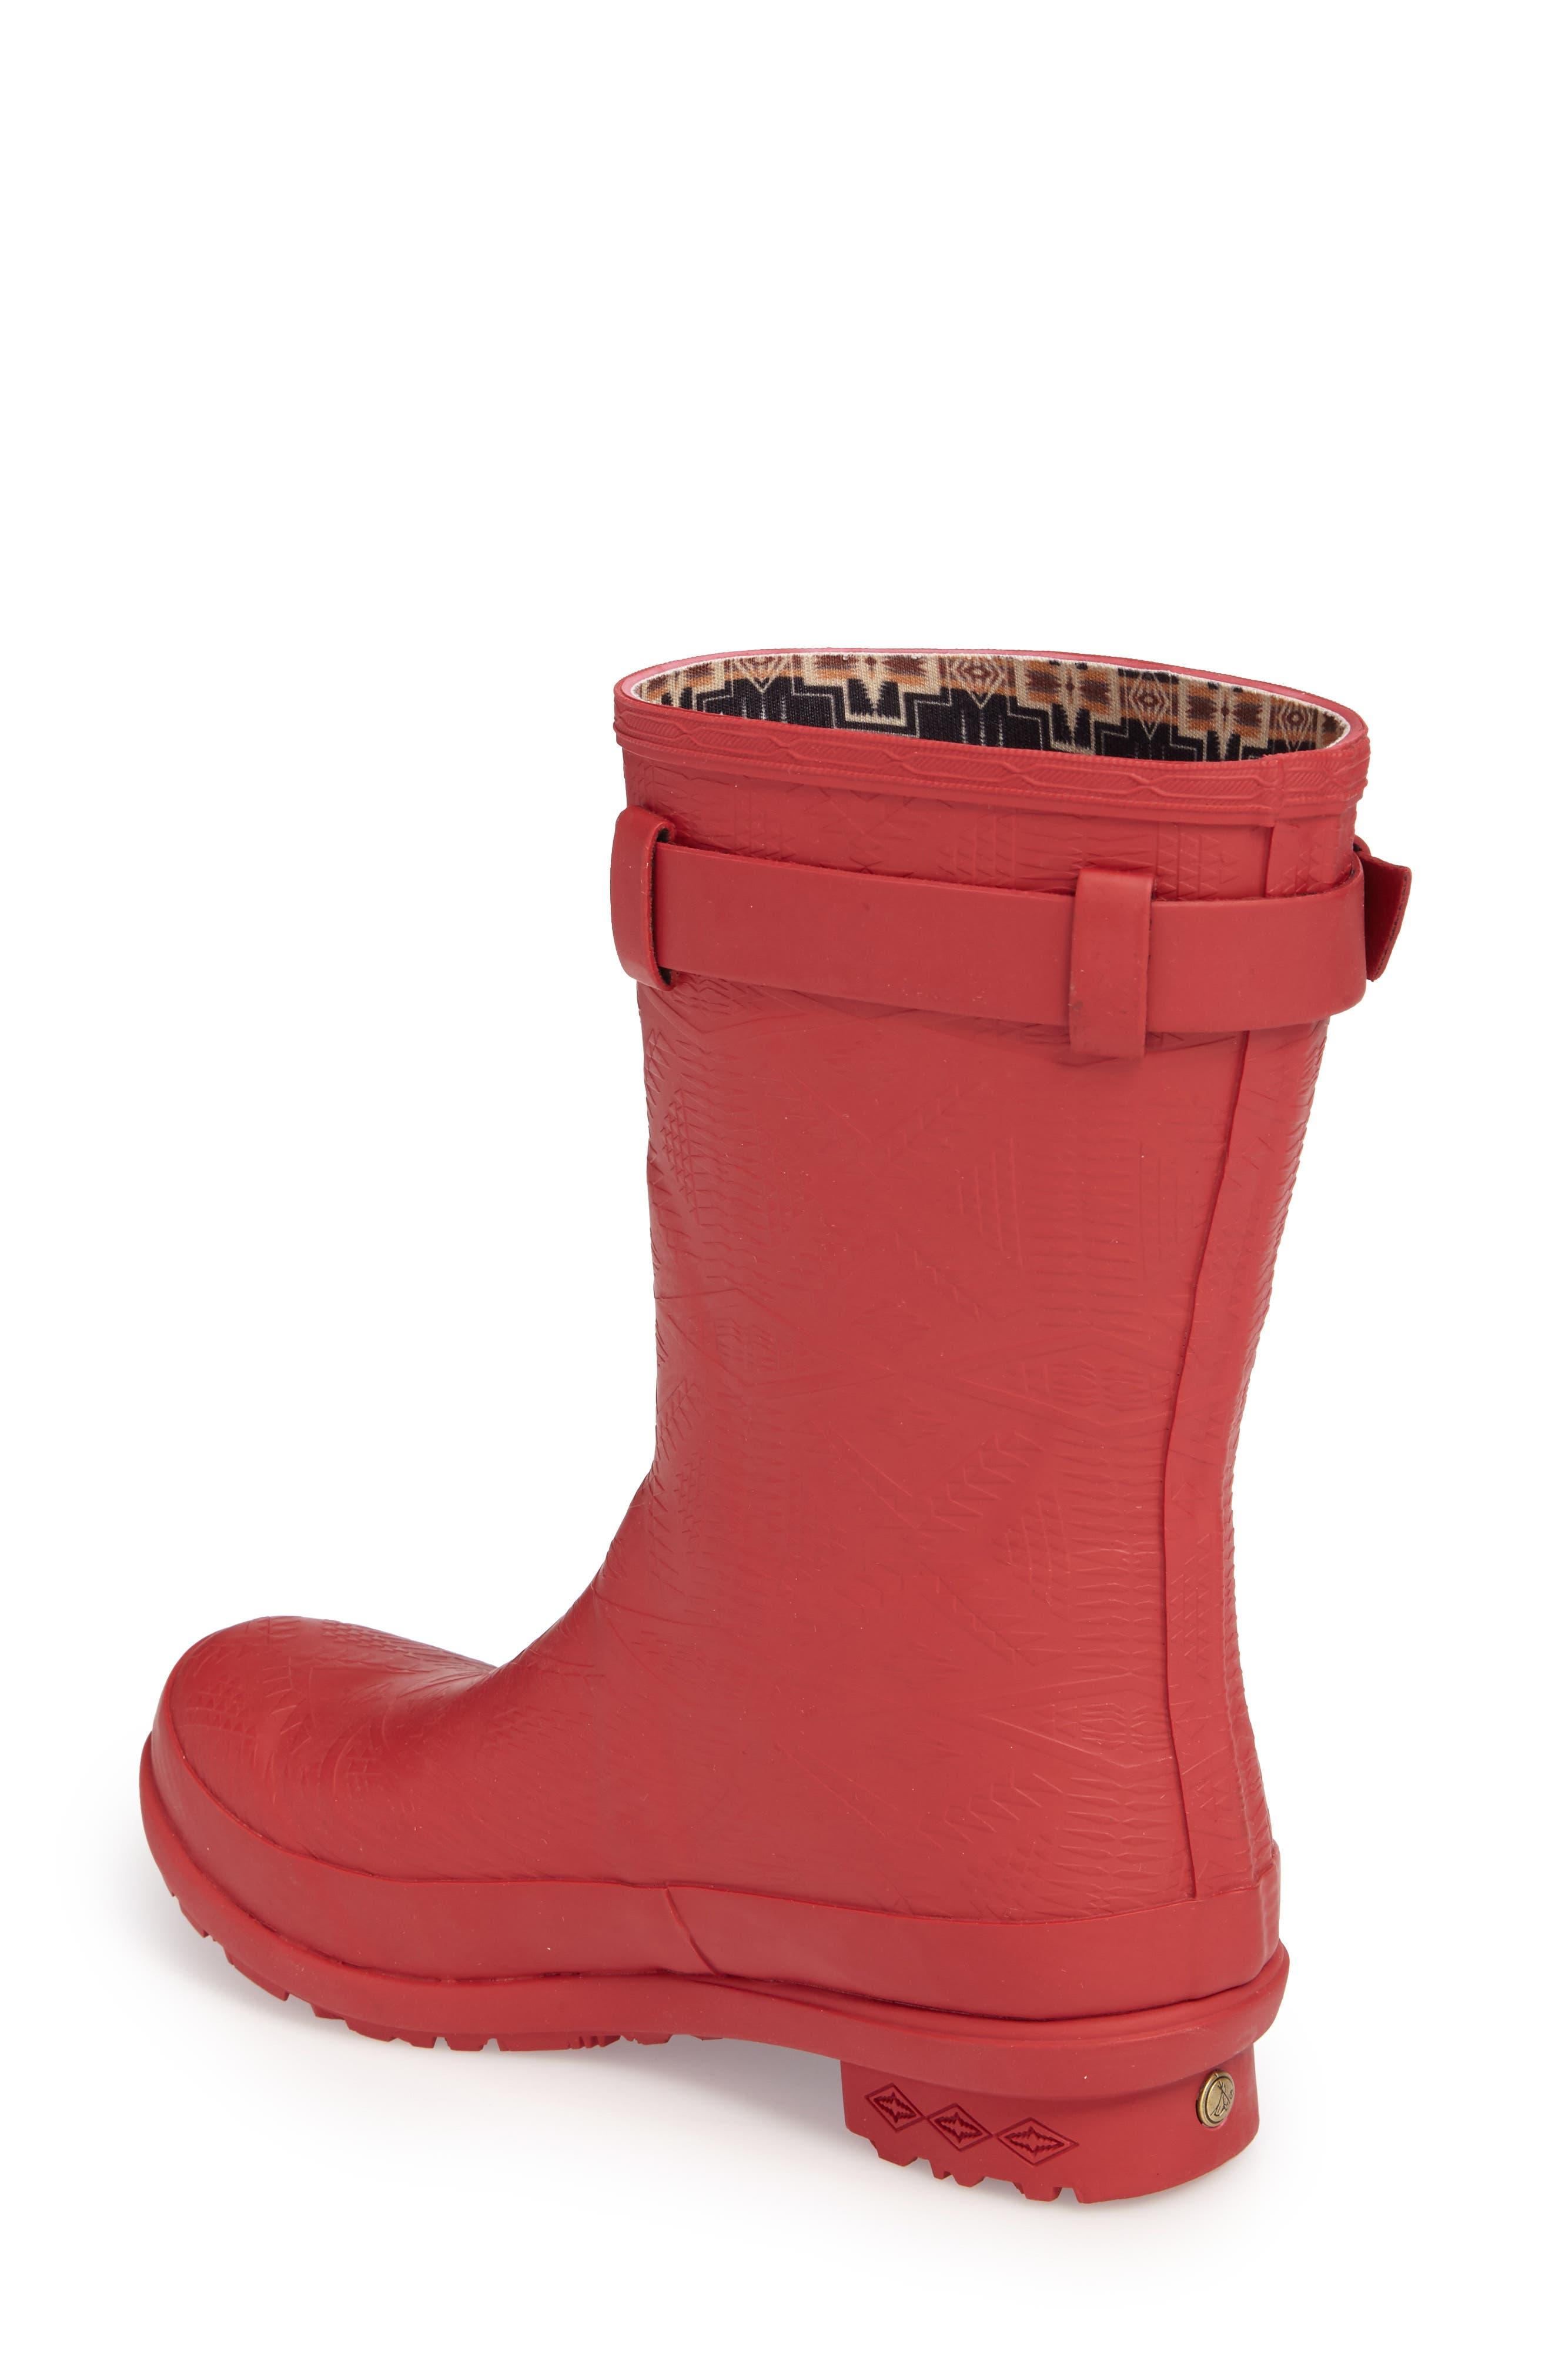 Pendleton Embossed Short Rain Boot,                             Alternate thumbnail 2, color,                             Scarlet